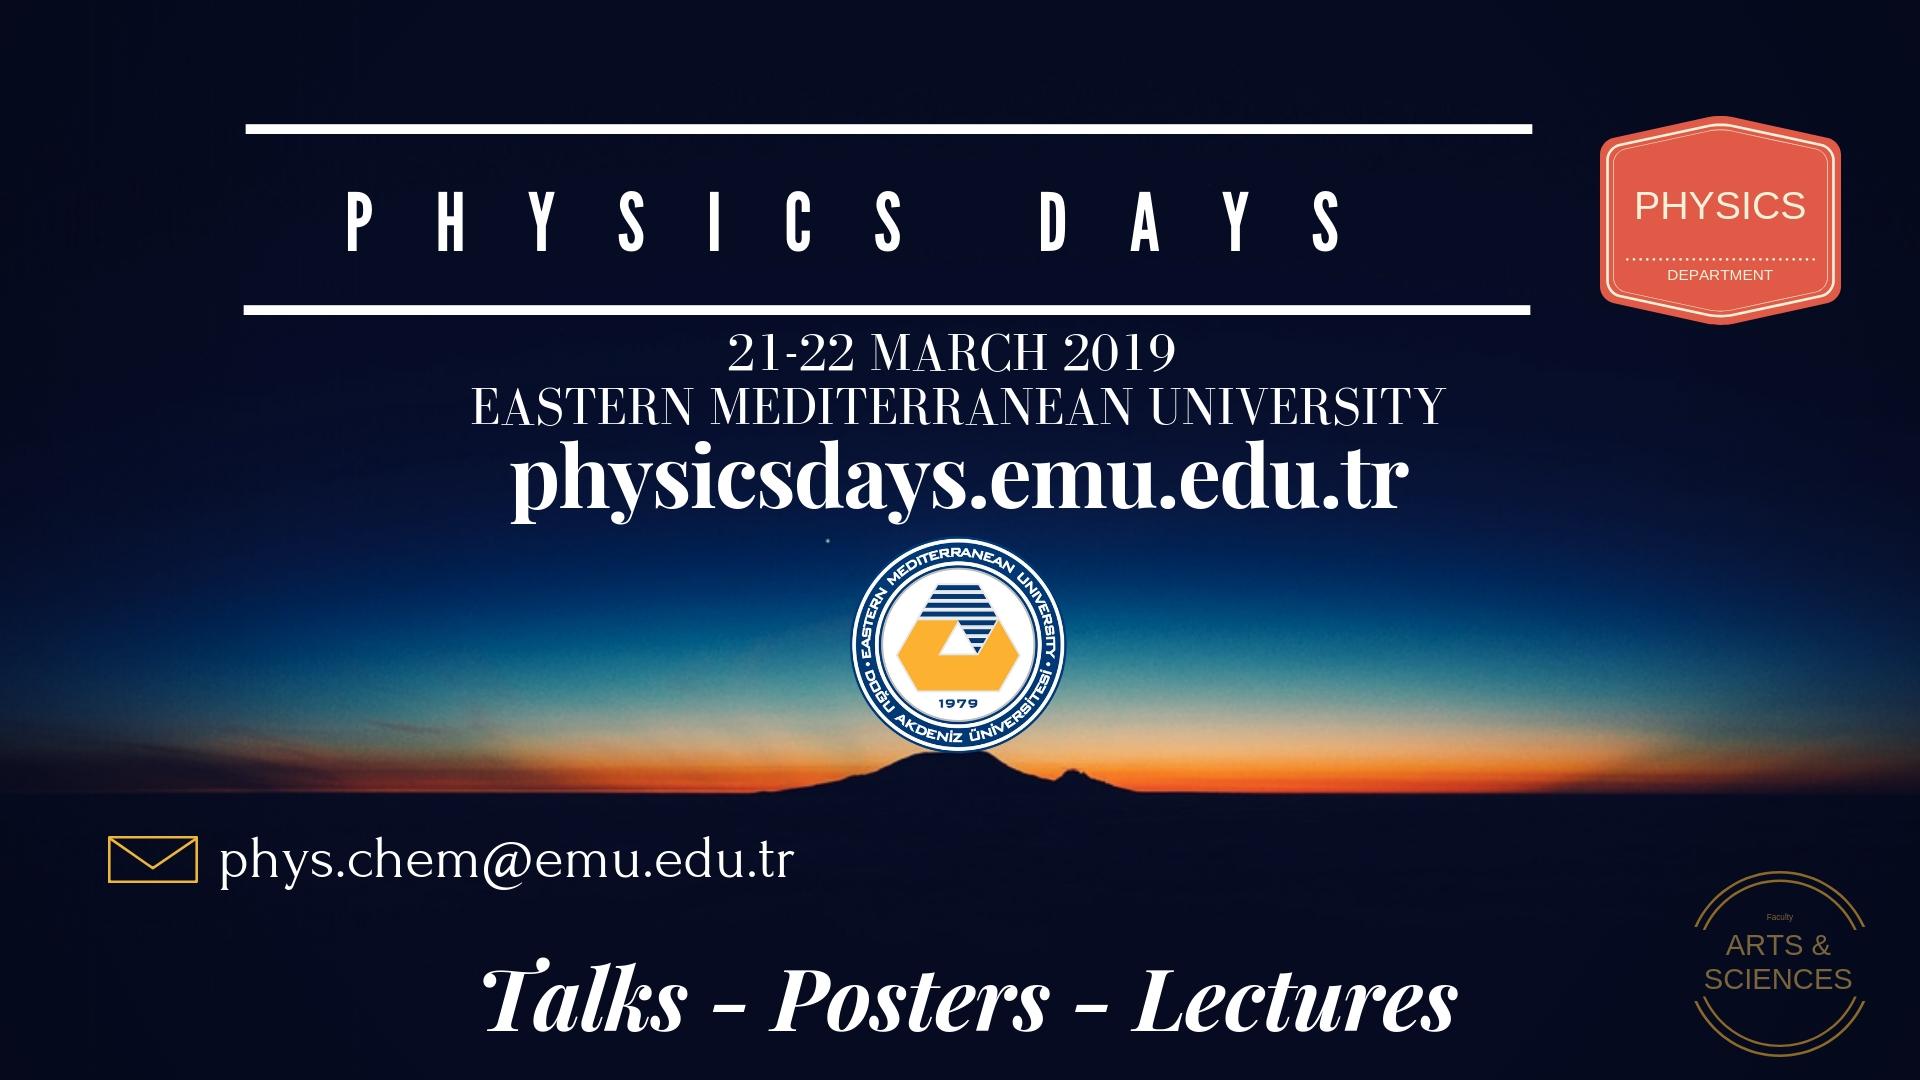 PHYSICS DAYS 2019